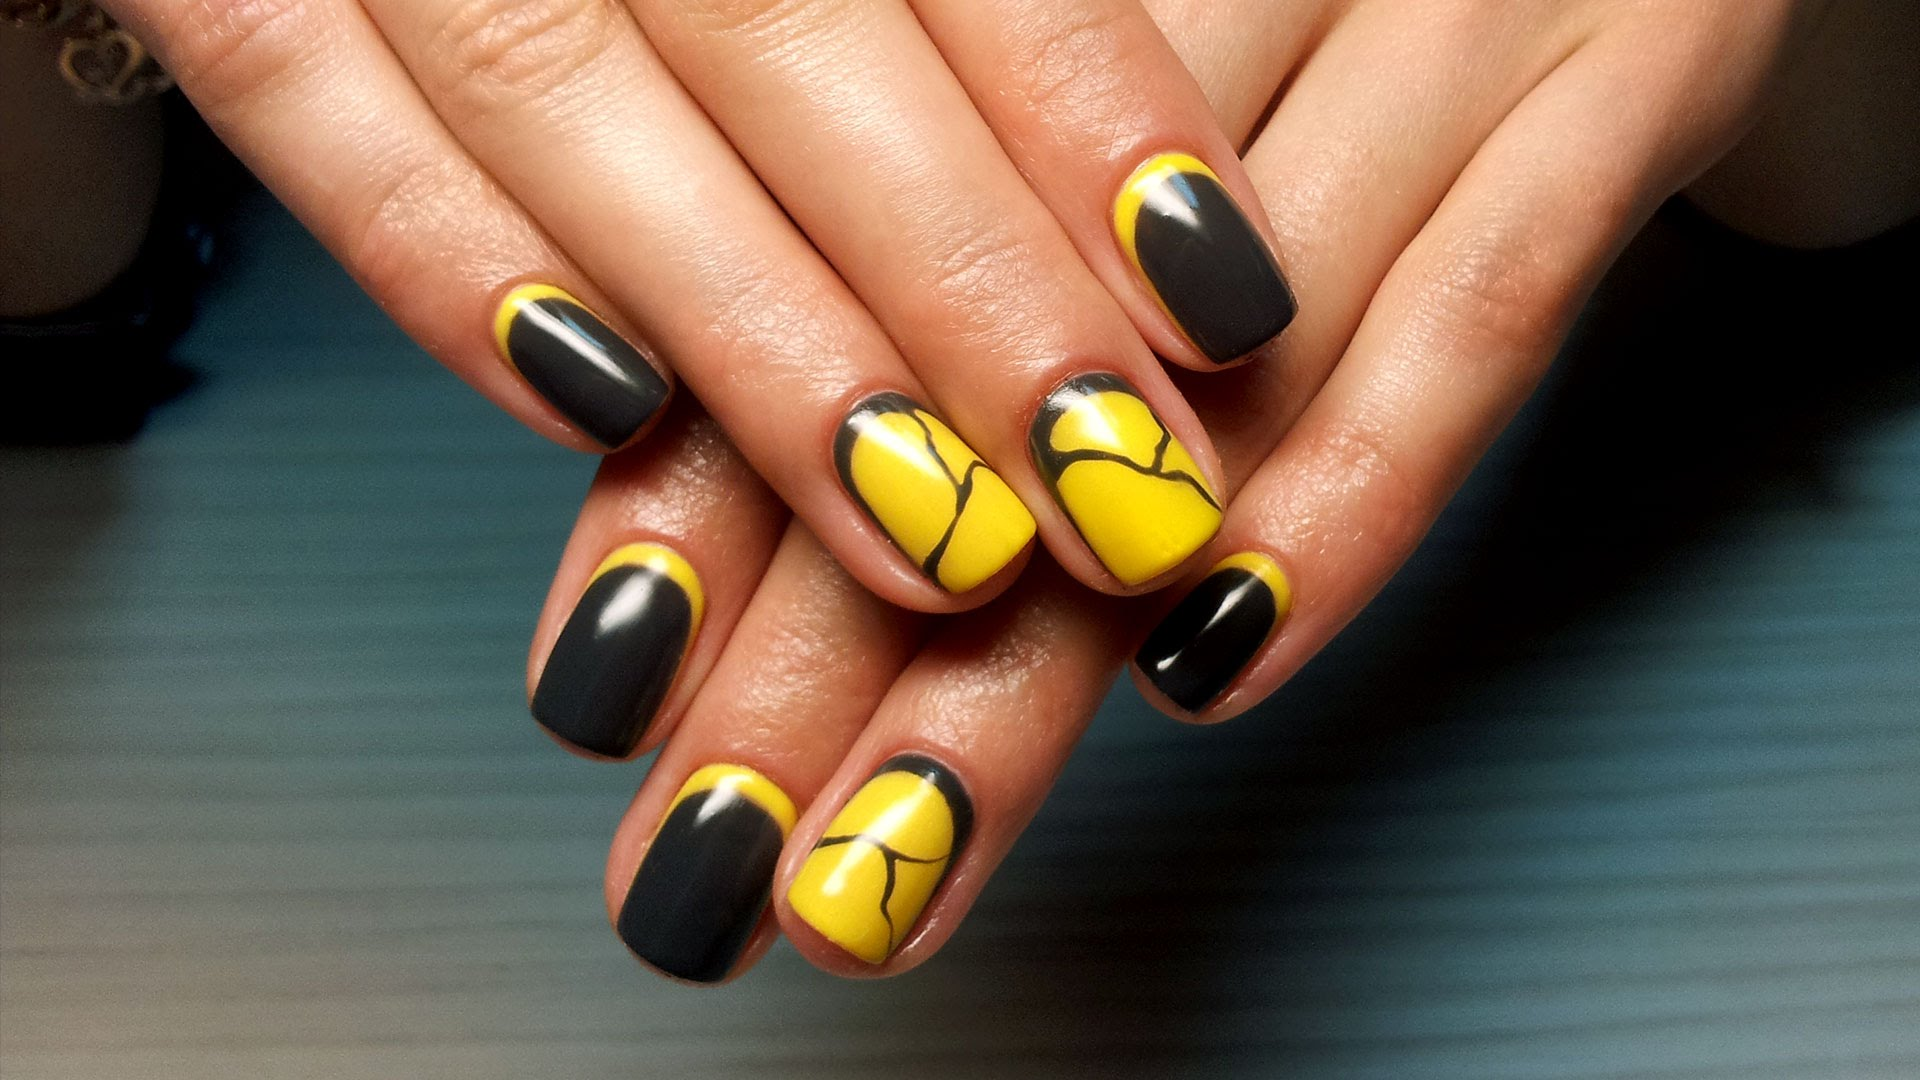 Дизайн ногтей шеллаком - фото новинки ...: receptibogini.ru/dizajn-nogtej-shellakom-33-foto-novinki-2016